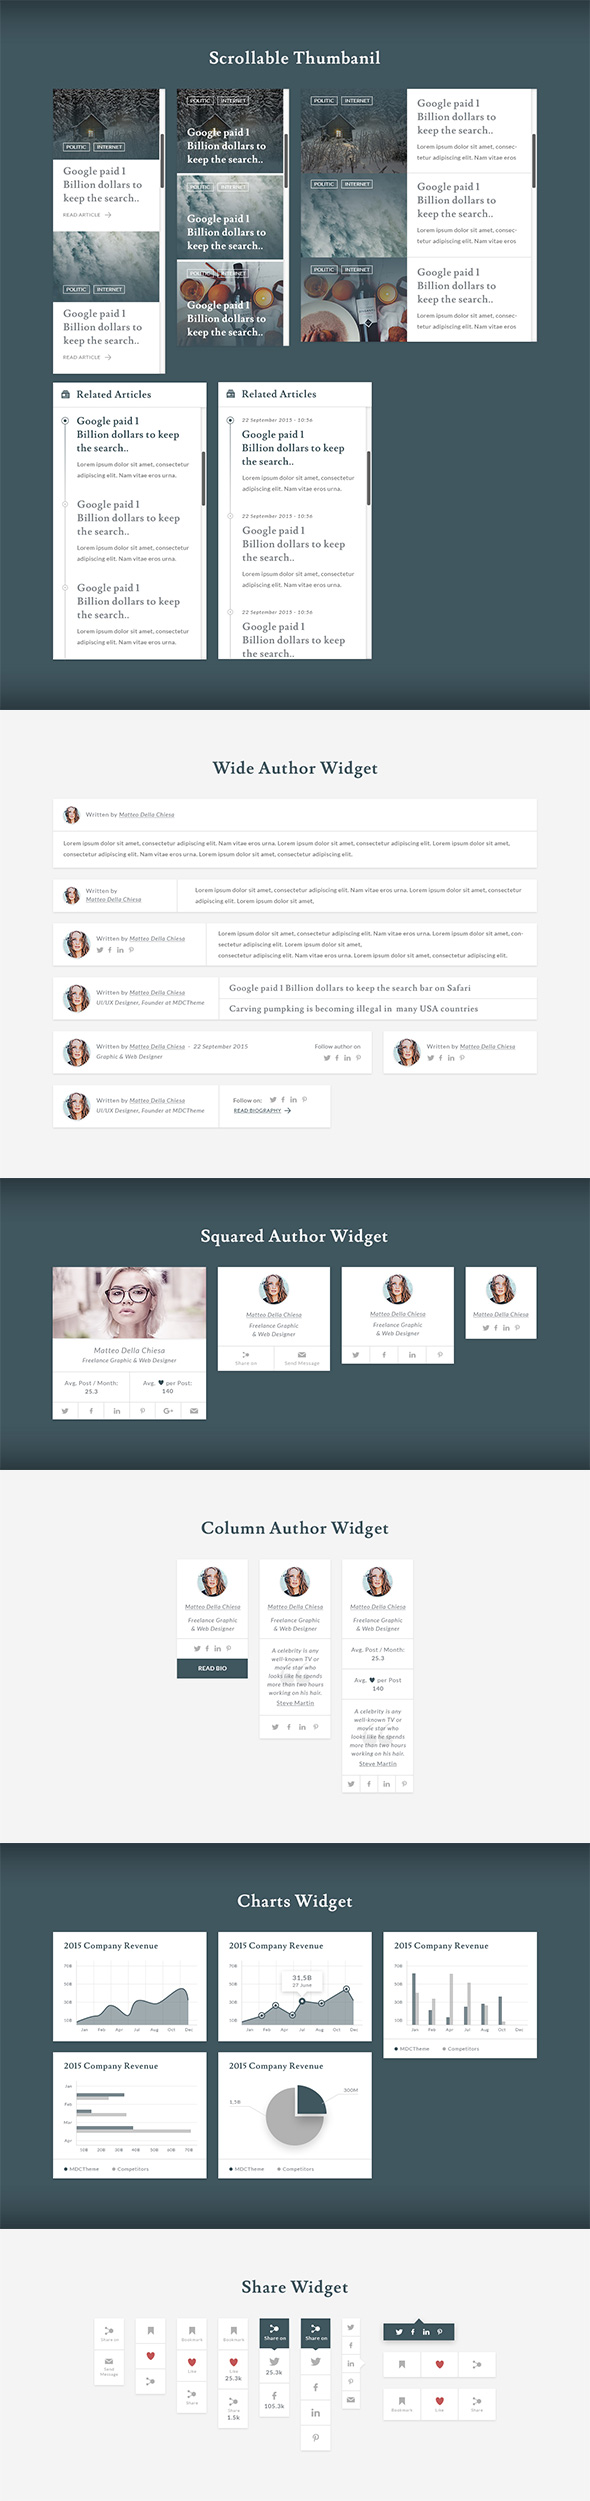 Blogant - UI Kit for Blogs & Magazines (User Interfaces)